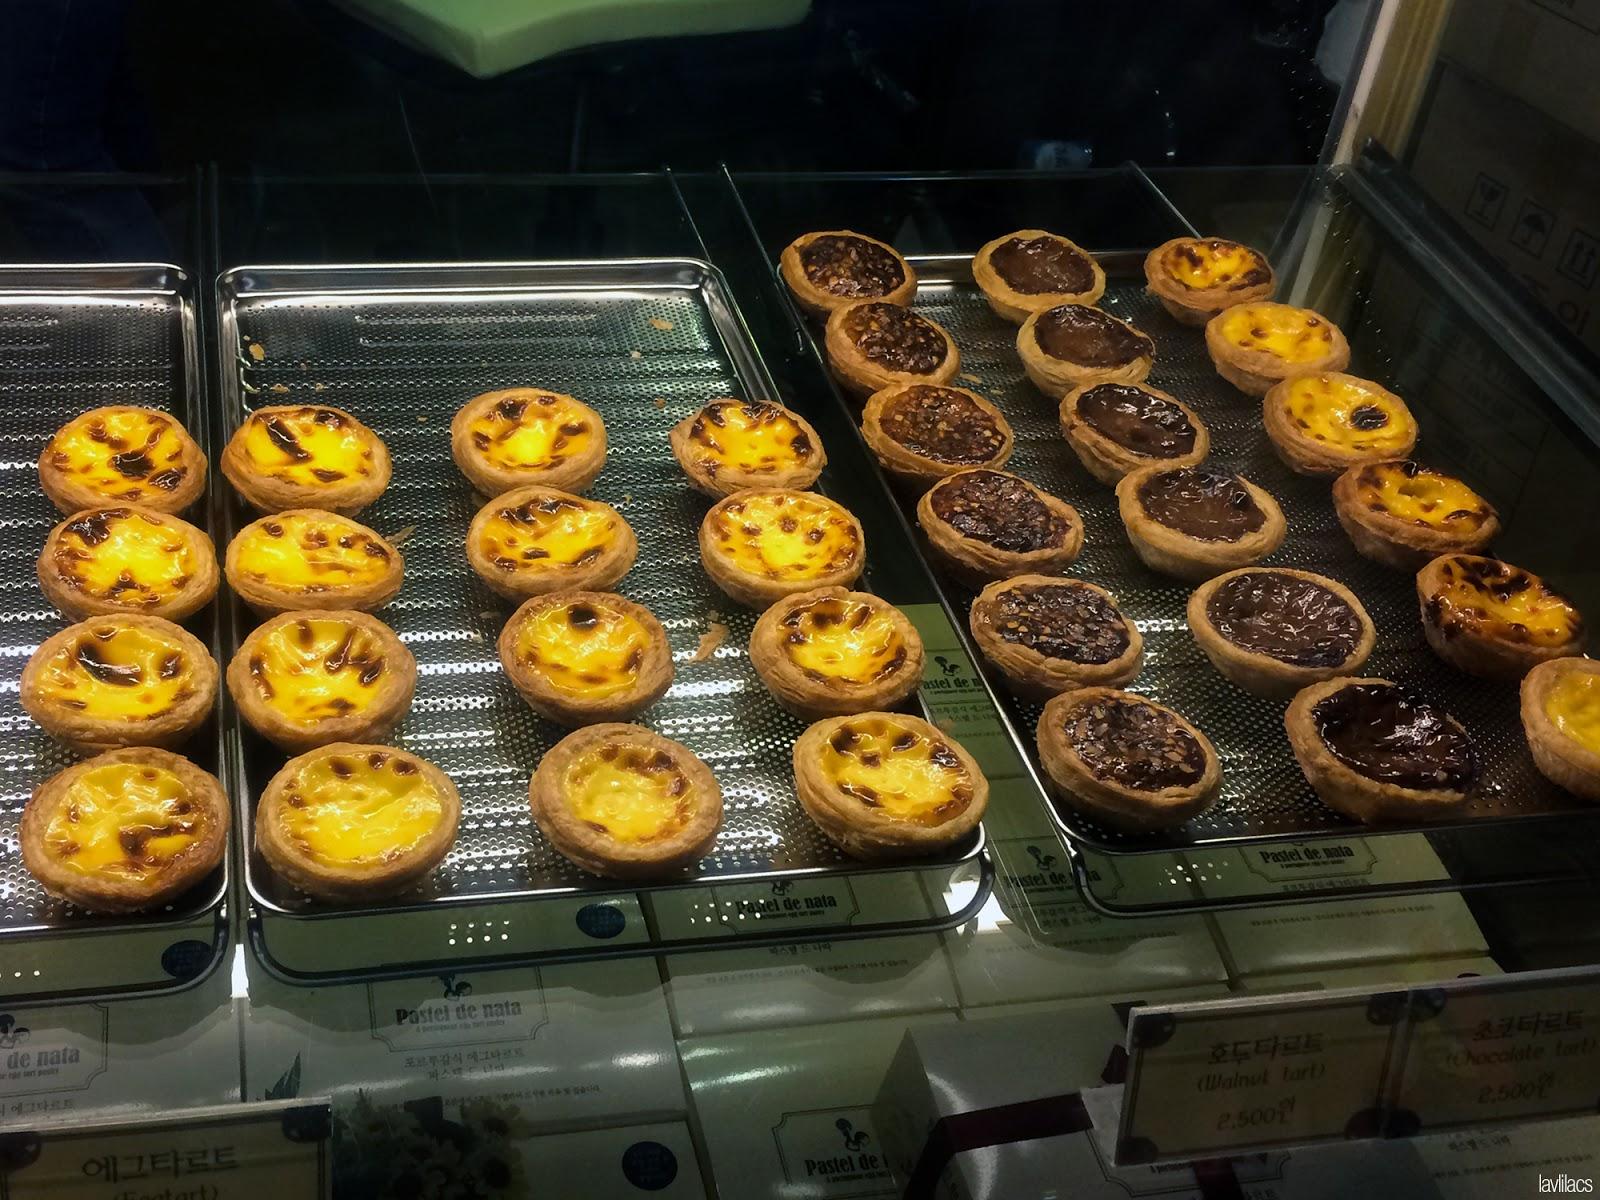 Seoul, Korea - Summer Study Abroad 2014 - Edae Pastel de nata Portuguese Egg Tarts